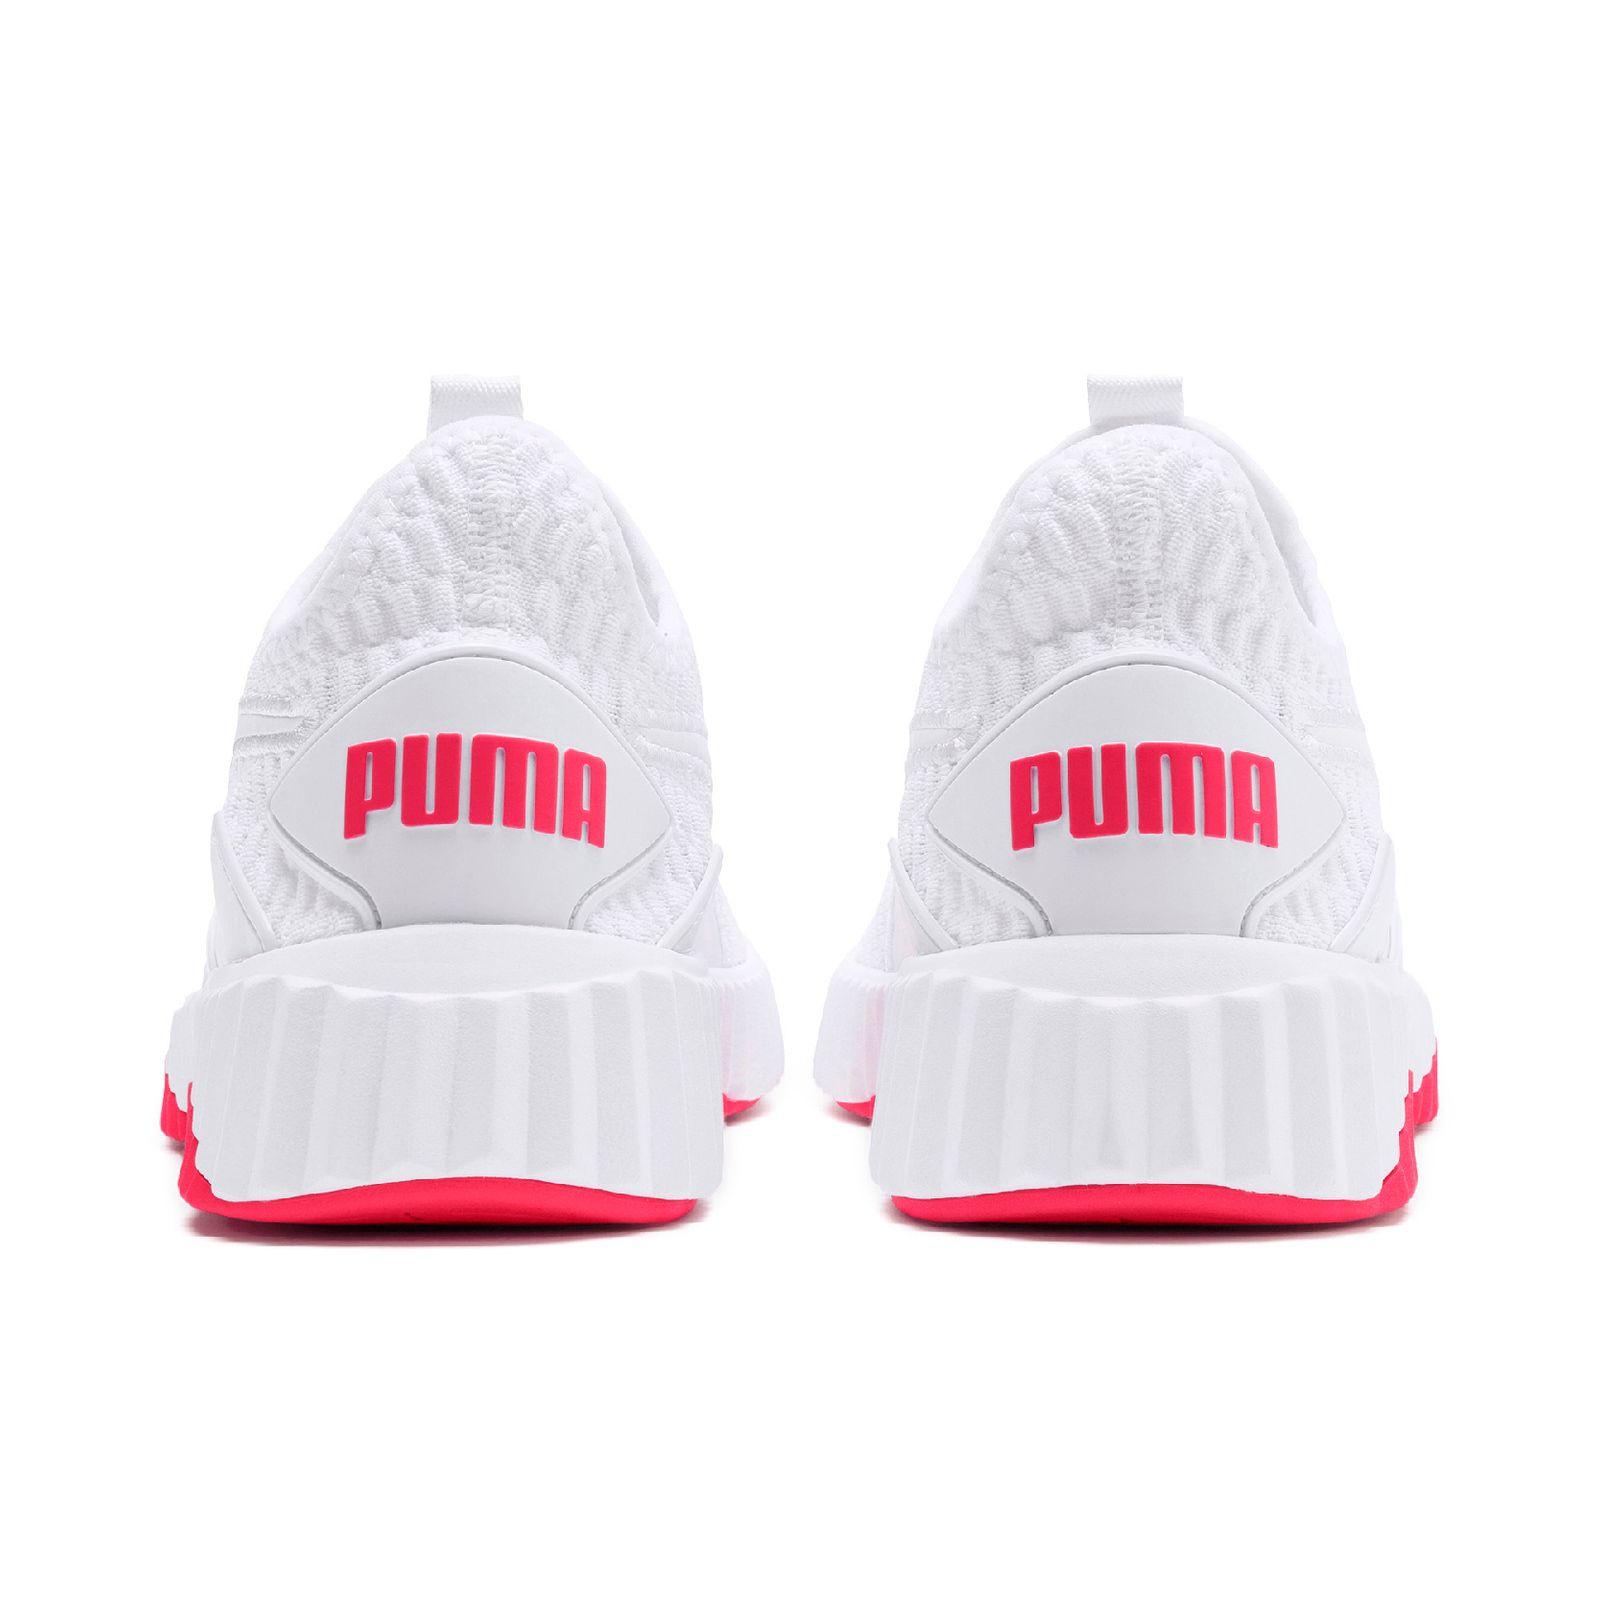 the latest 36e06 da9cb PUMA Defy Wns Damen Low Boot Sneaker Sportschuhe Weiss-Rosa